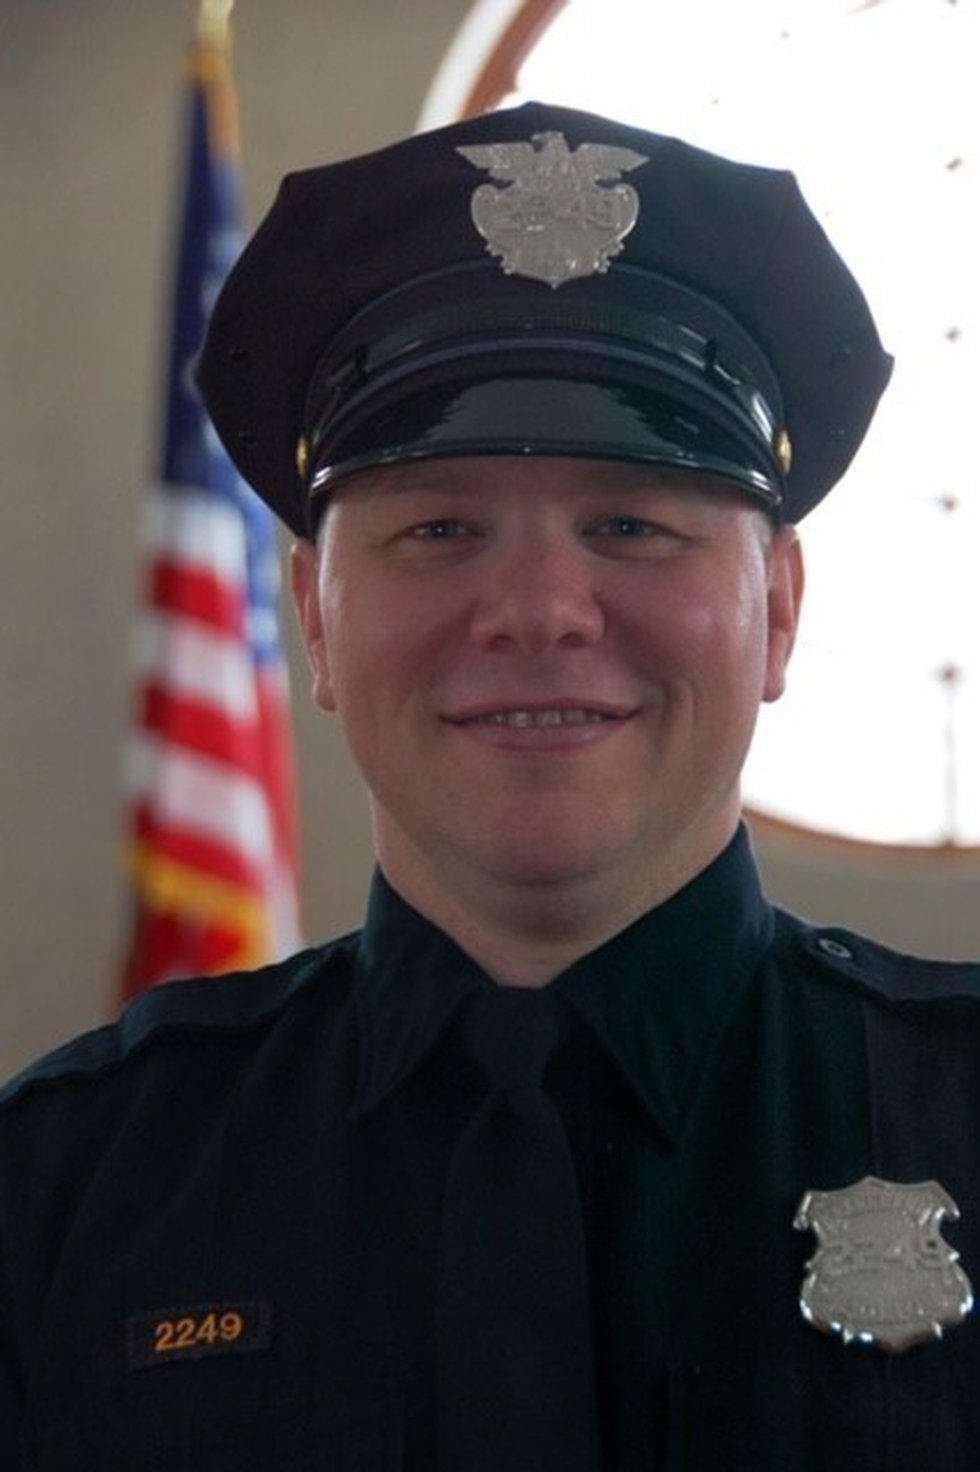 Detective James Skernivitz